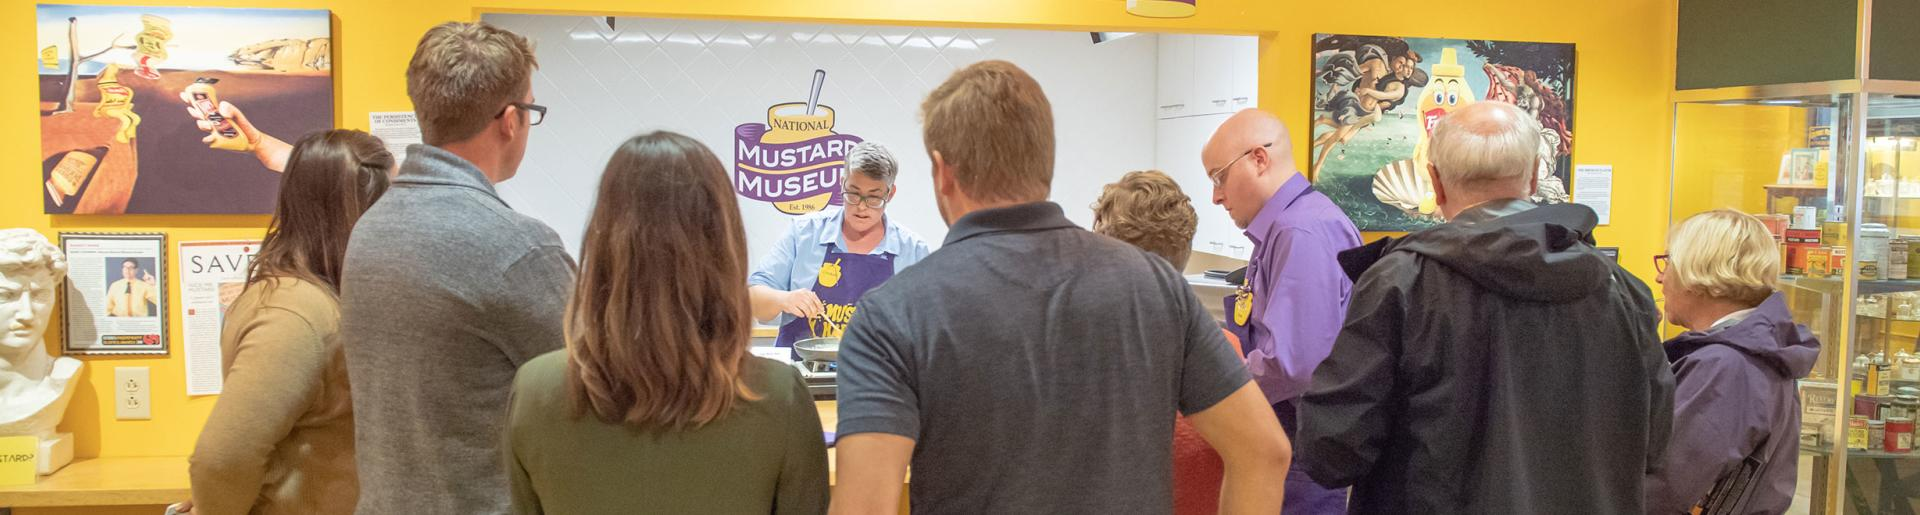 Mustard Museum Microsite Header